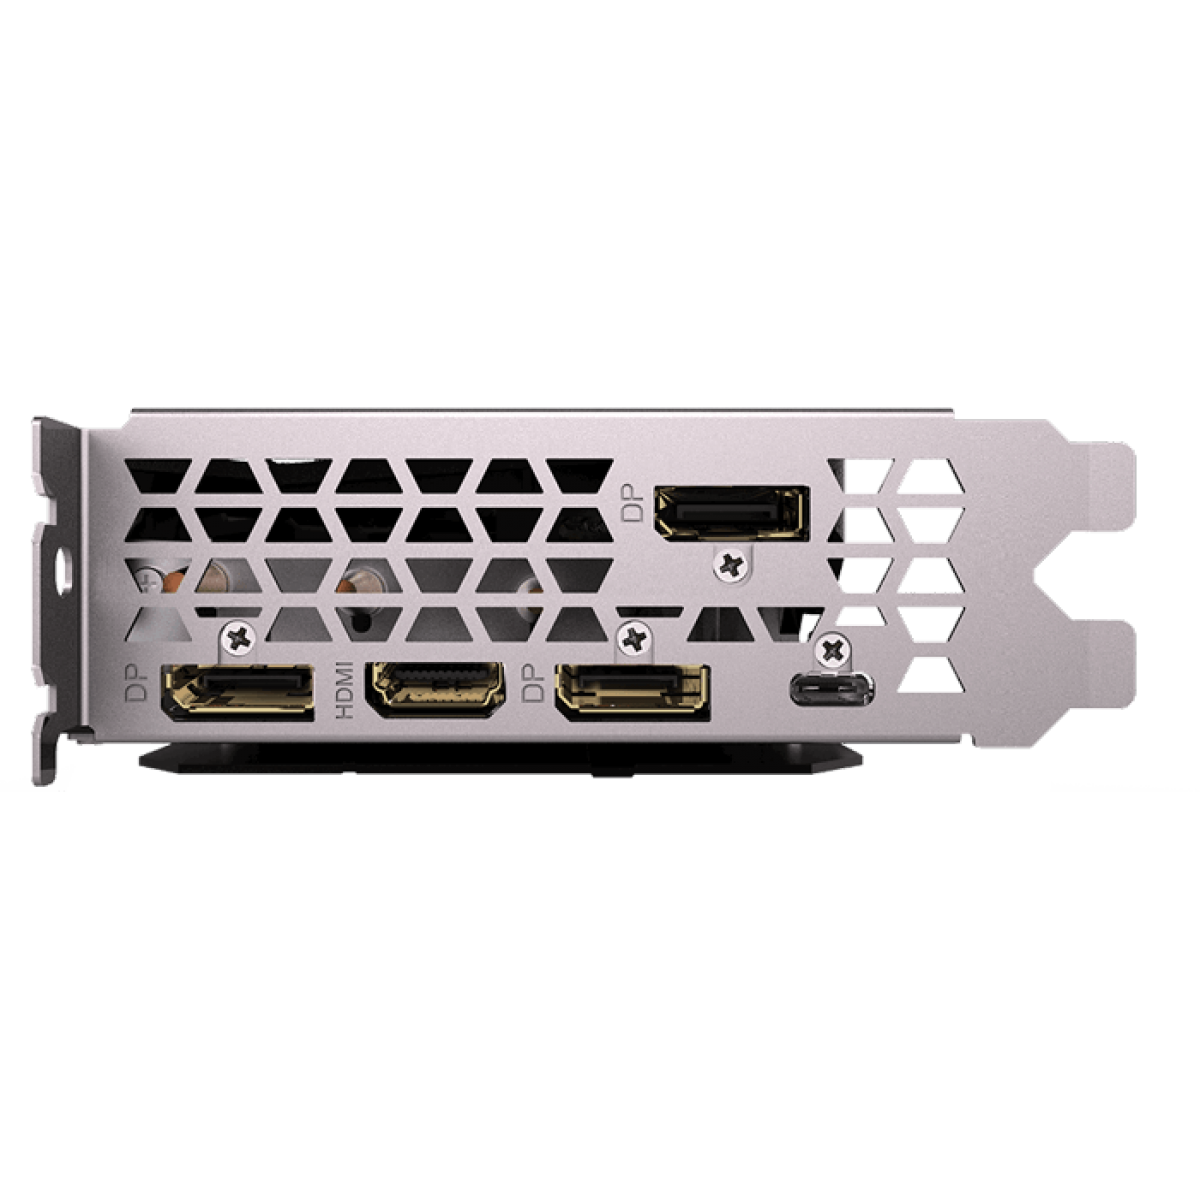 Placa De Vídeo Gigabyte Geforce RTX 2080 Ti Windforce, 11GB GDDR6, 352Bit